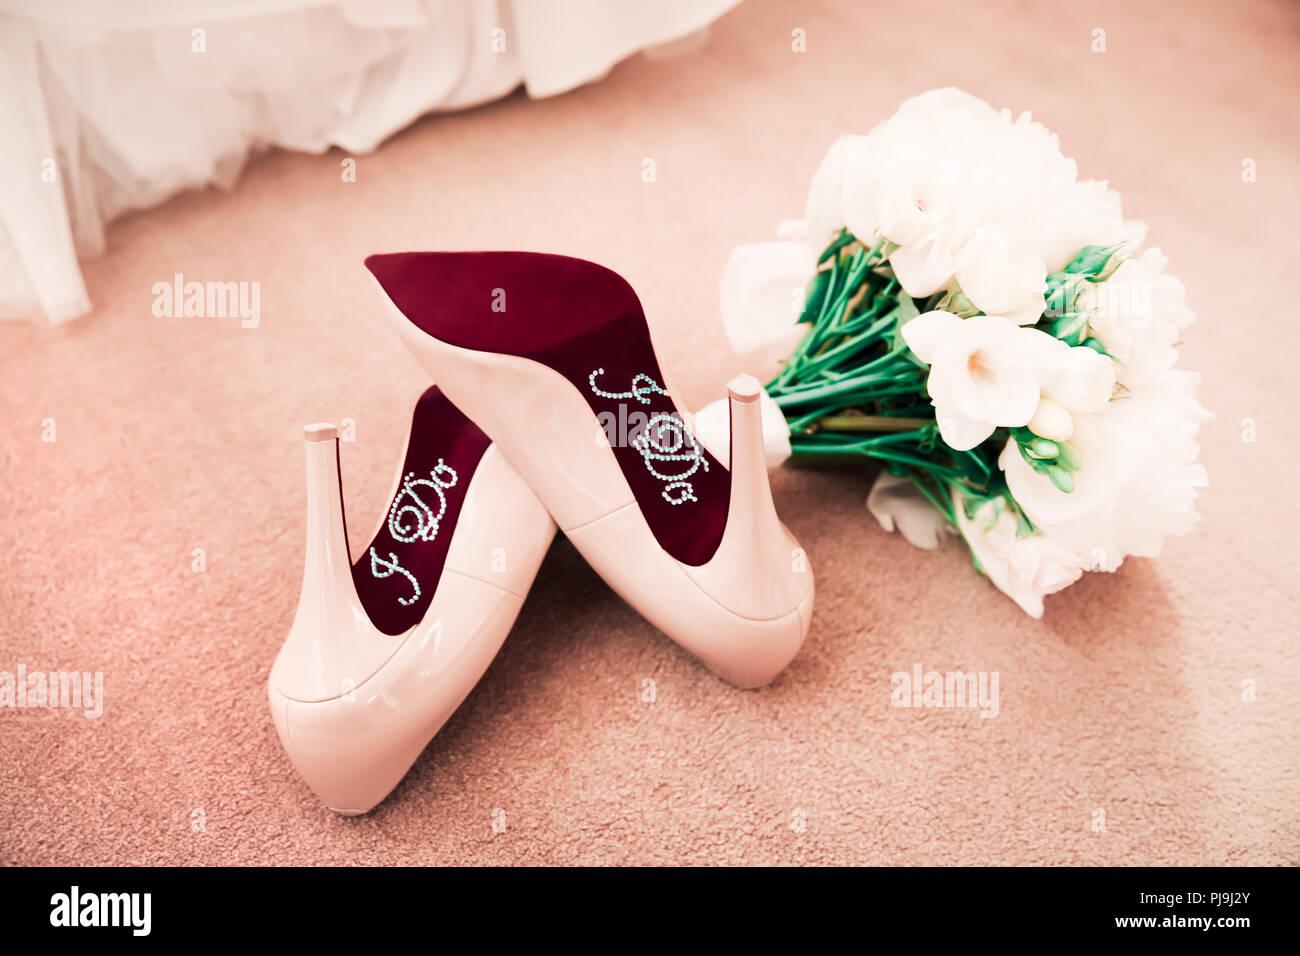 5e930860367 Wedding Shoes Stock Photos & Wedding Shoes Stock Images - Alamy